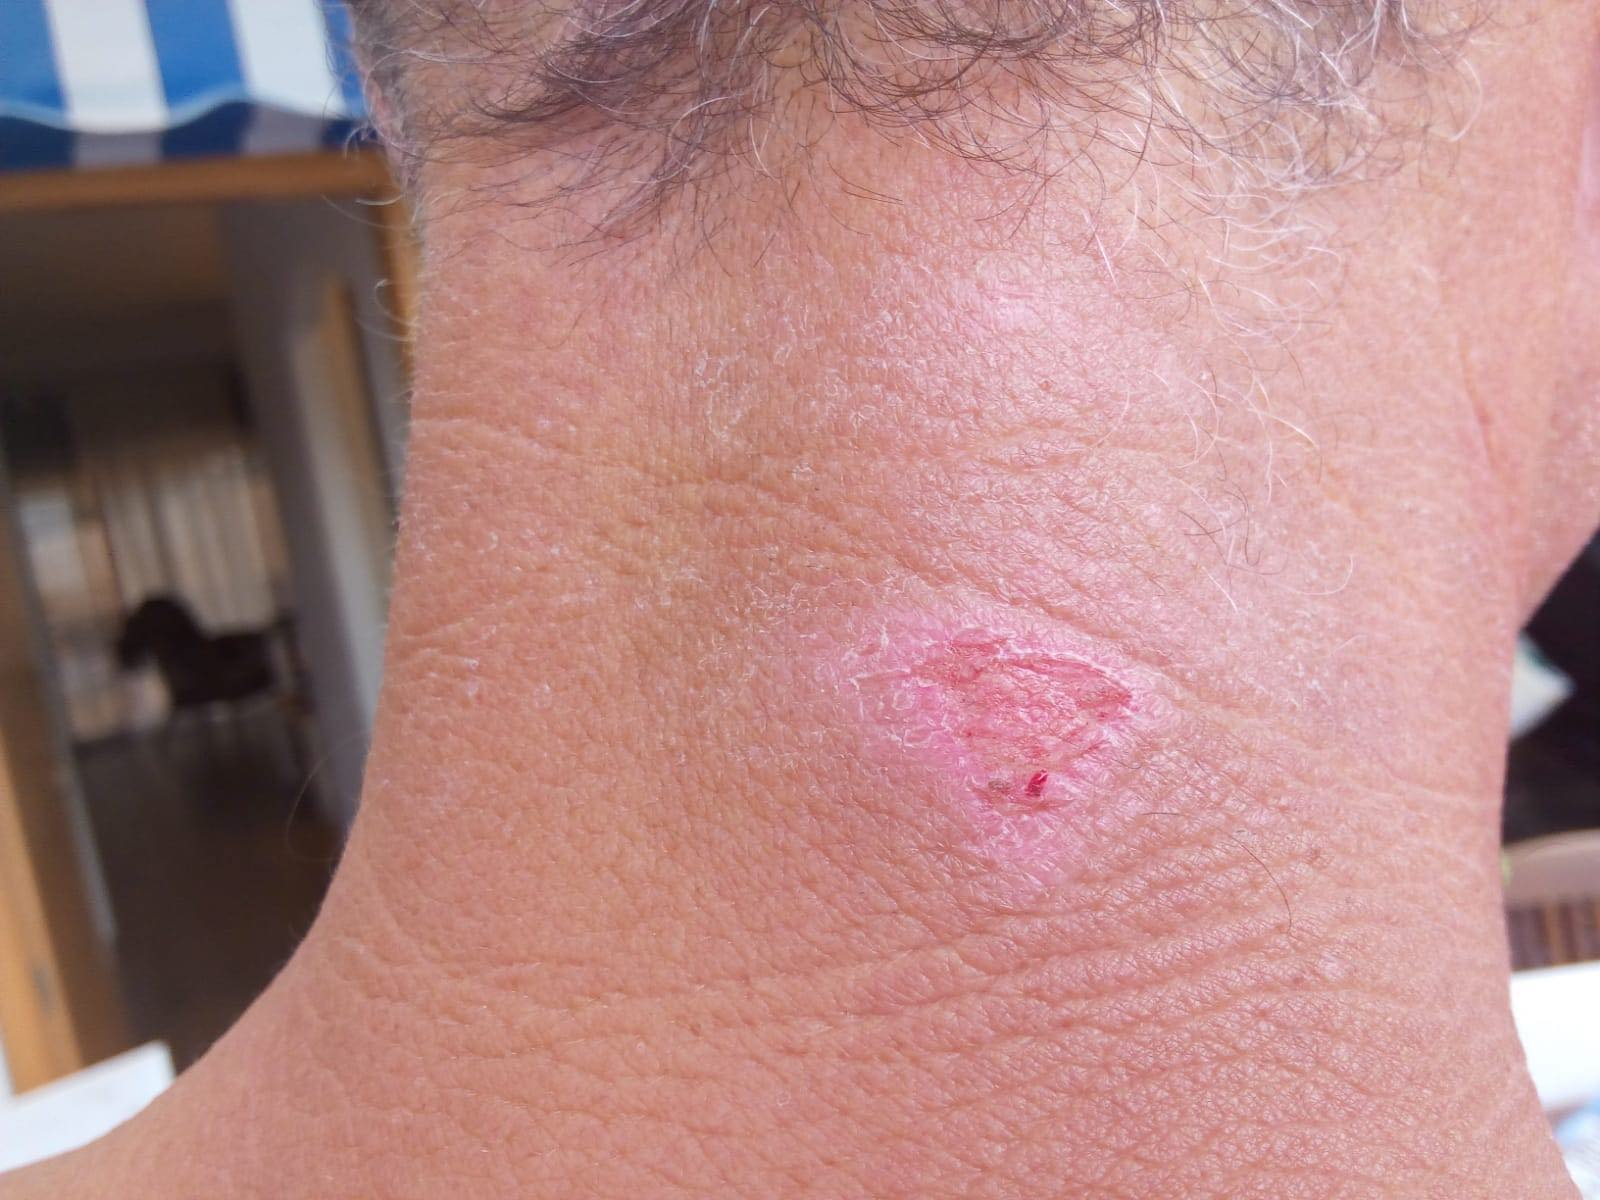 SwimRun wetsuit neck abrasion afteraloe